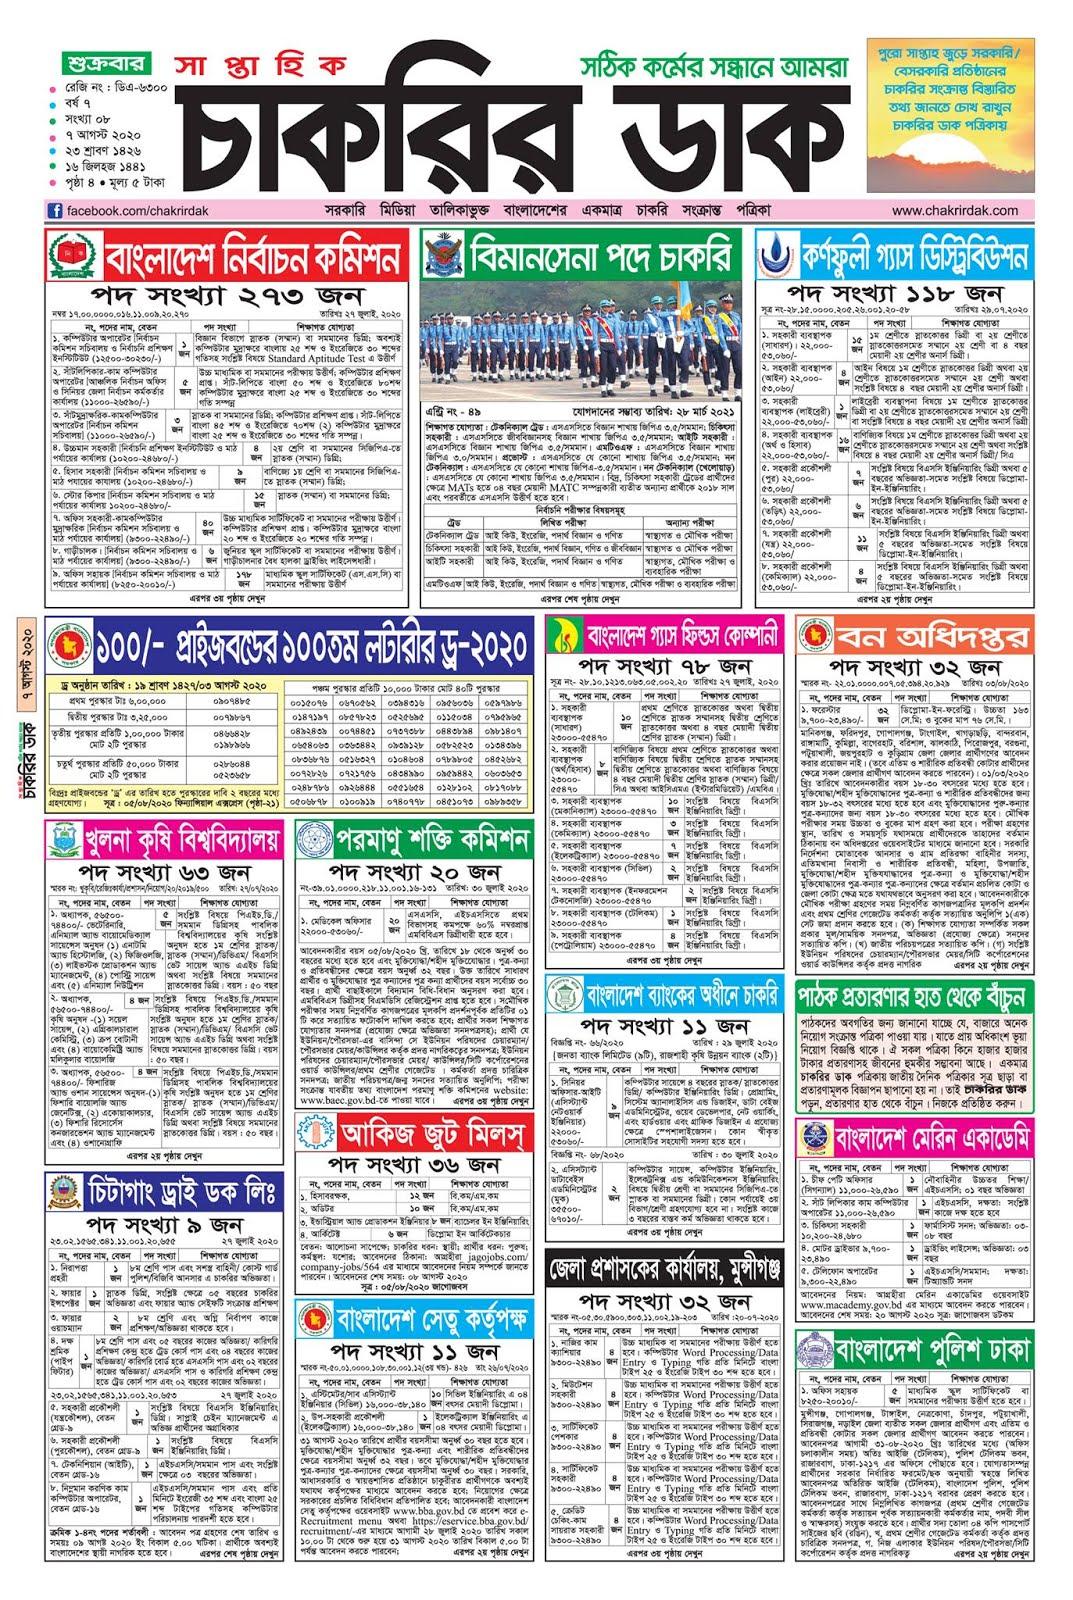 Saptahik Chakrir Khobor 07 August 2020 সাপ্তাহিক চাকরির খবর পত্রিকা